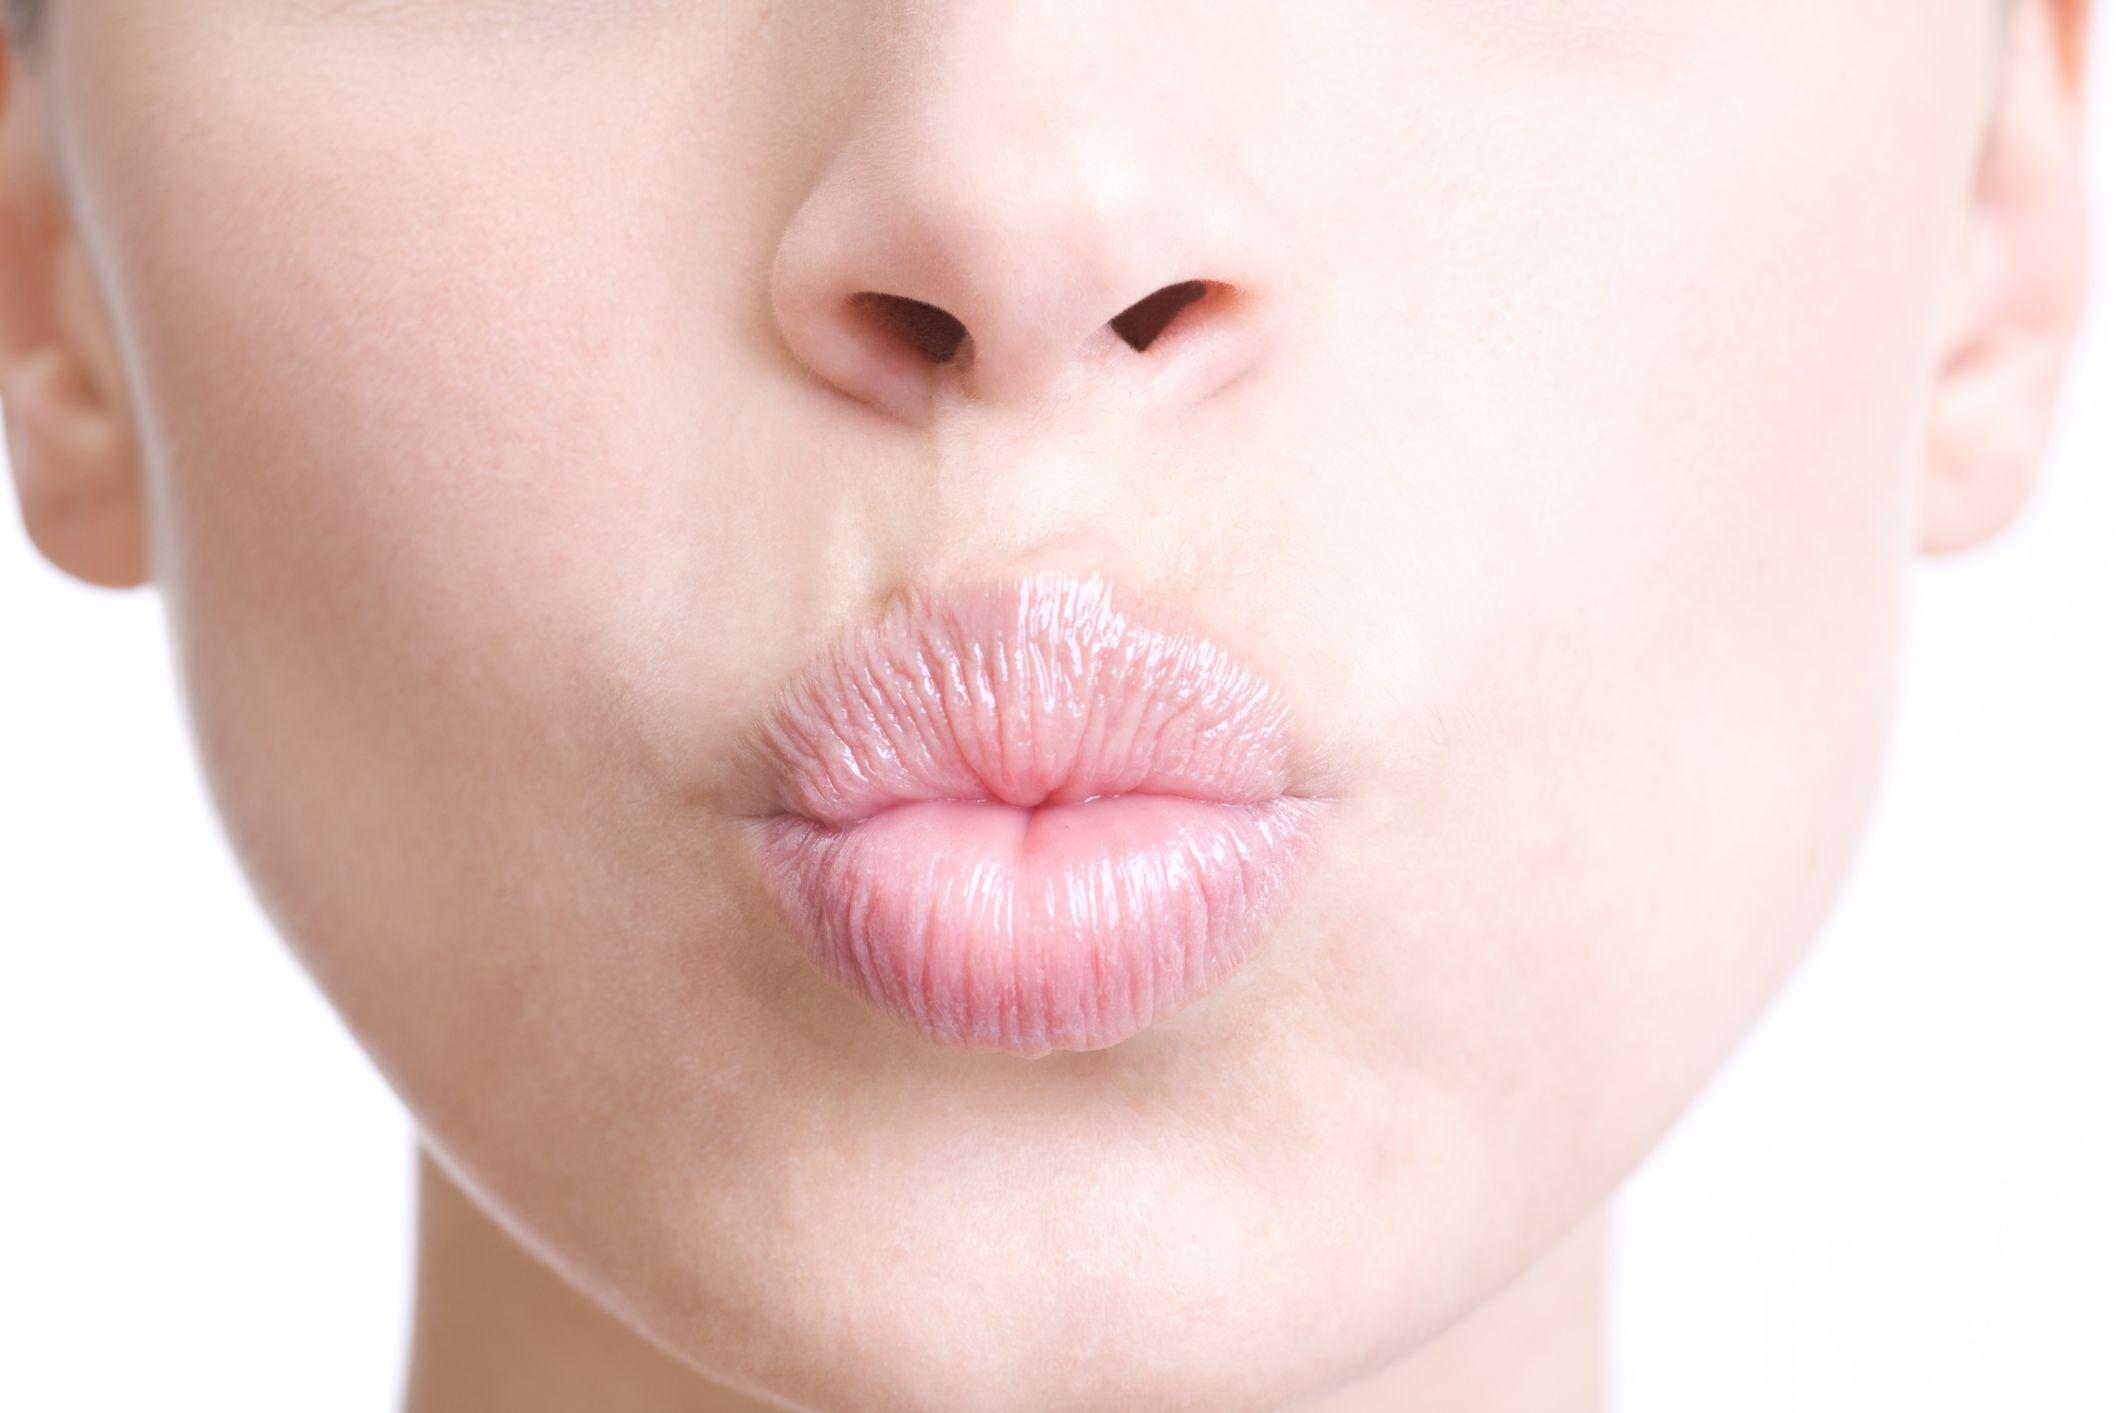 Woman puckering lips